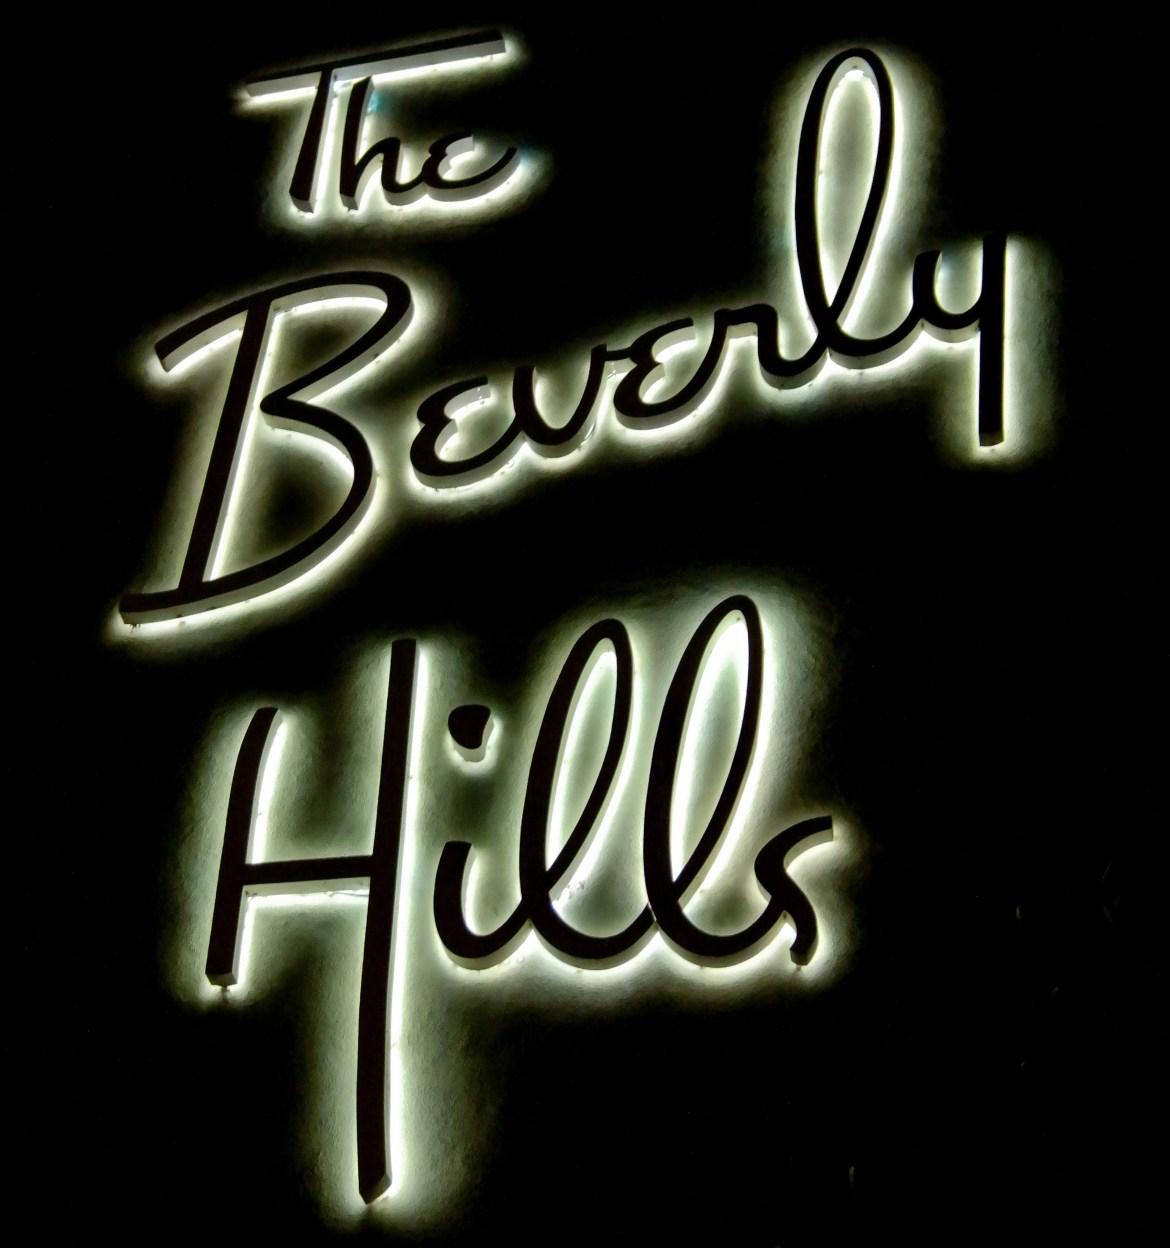 #Thebeverlyhills